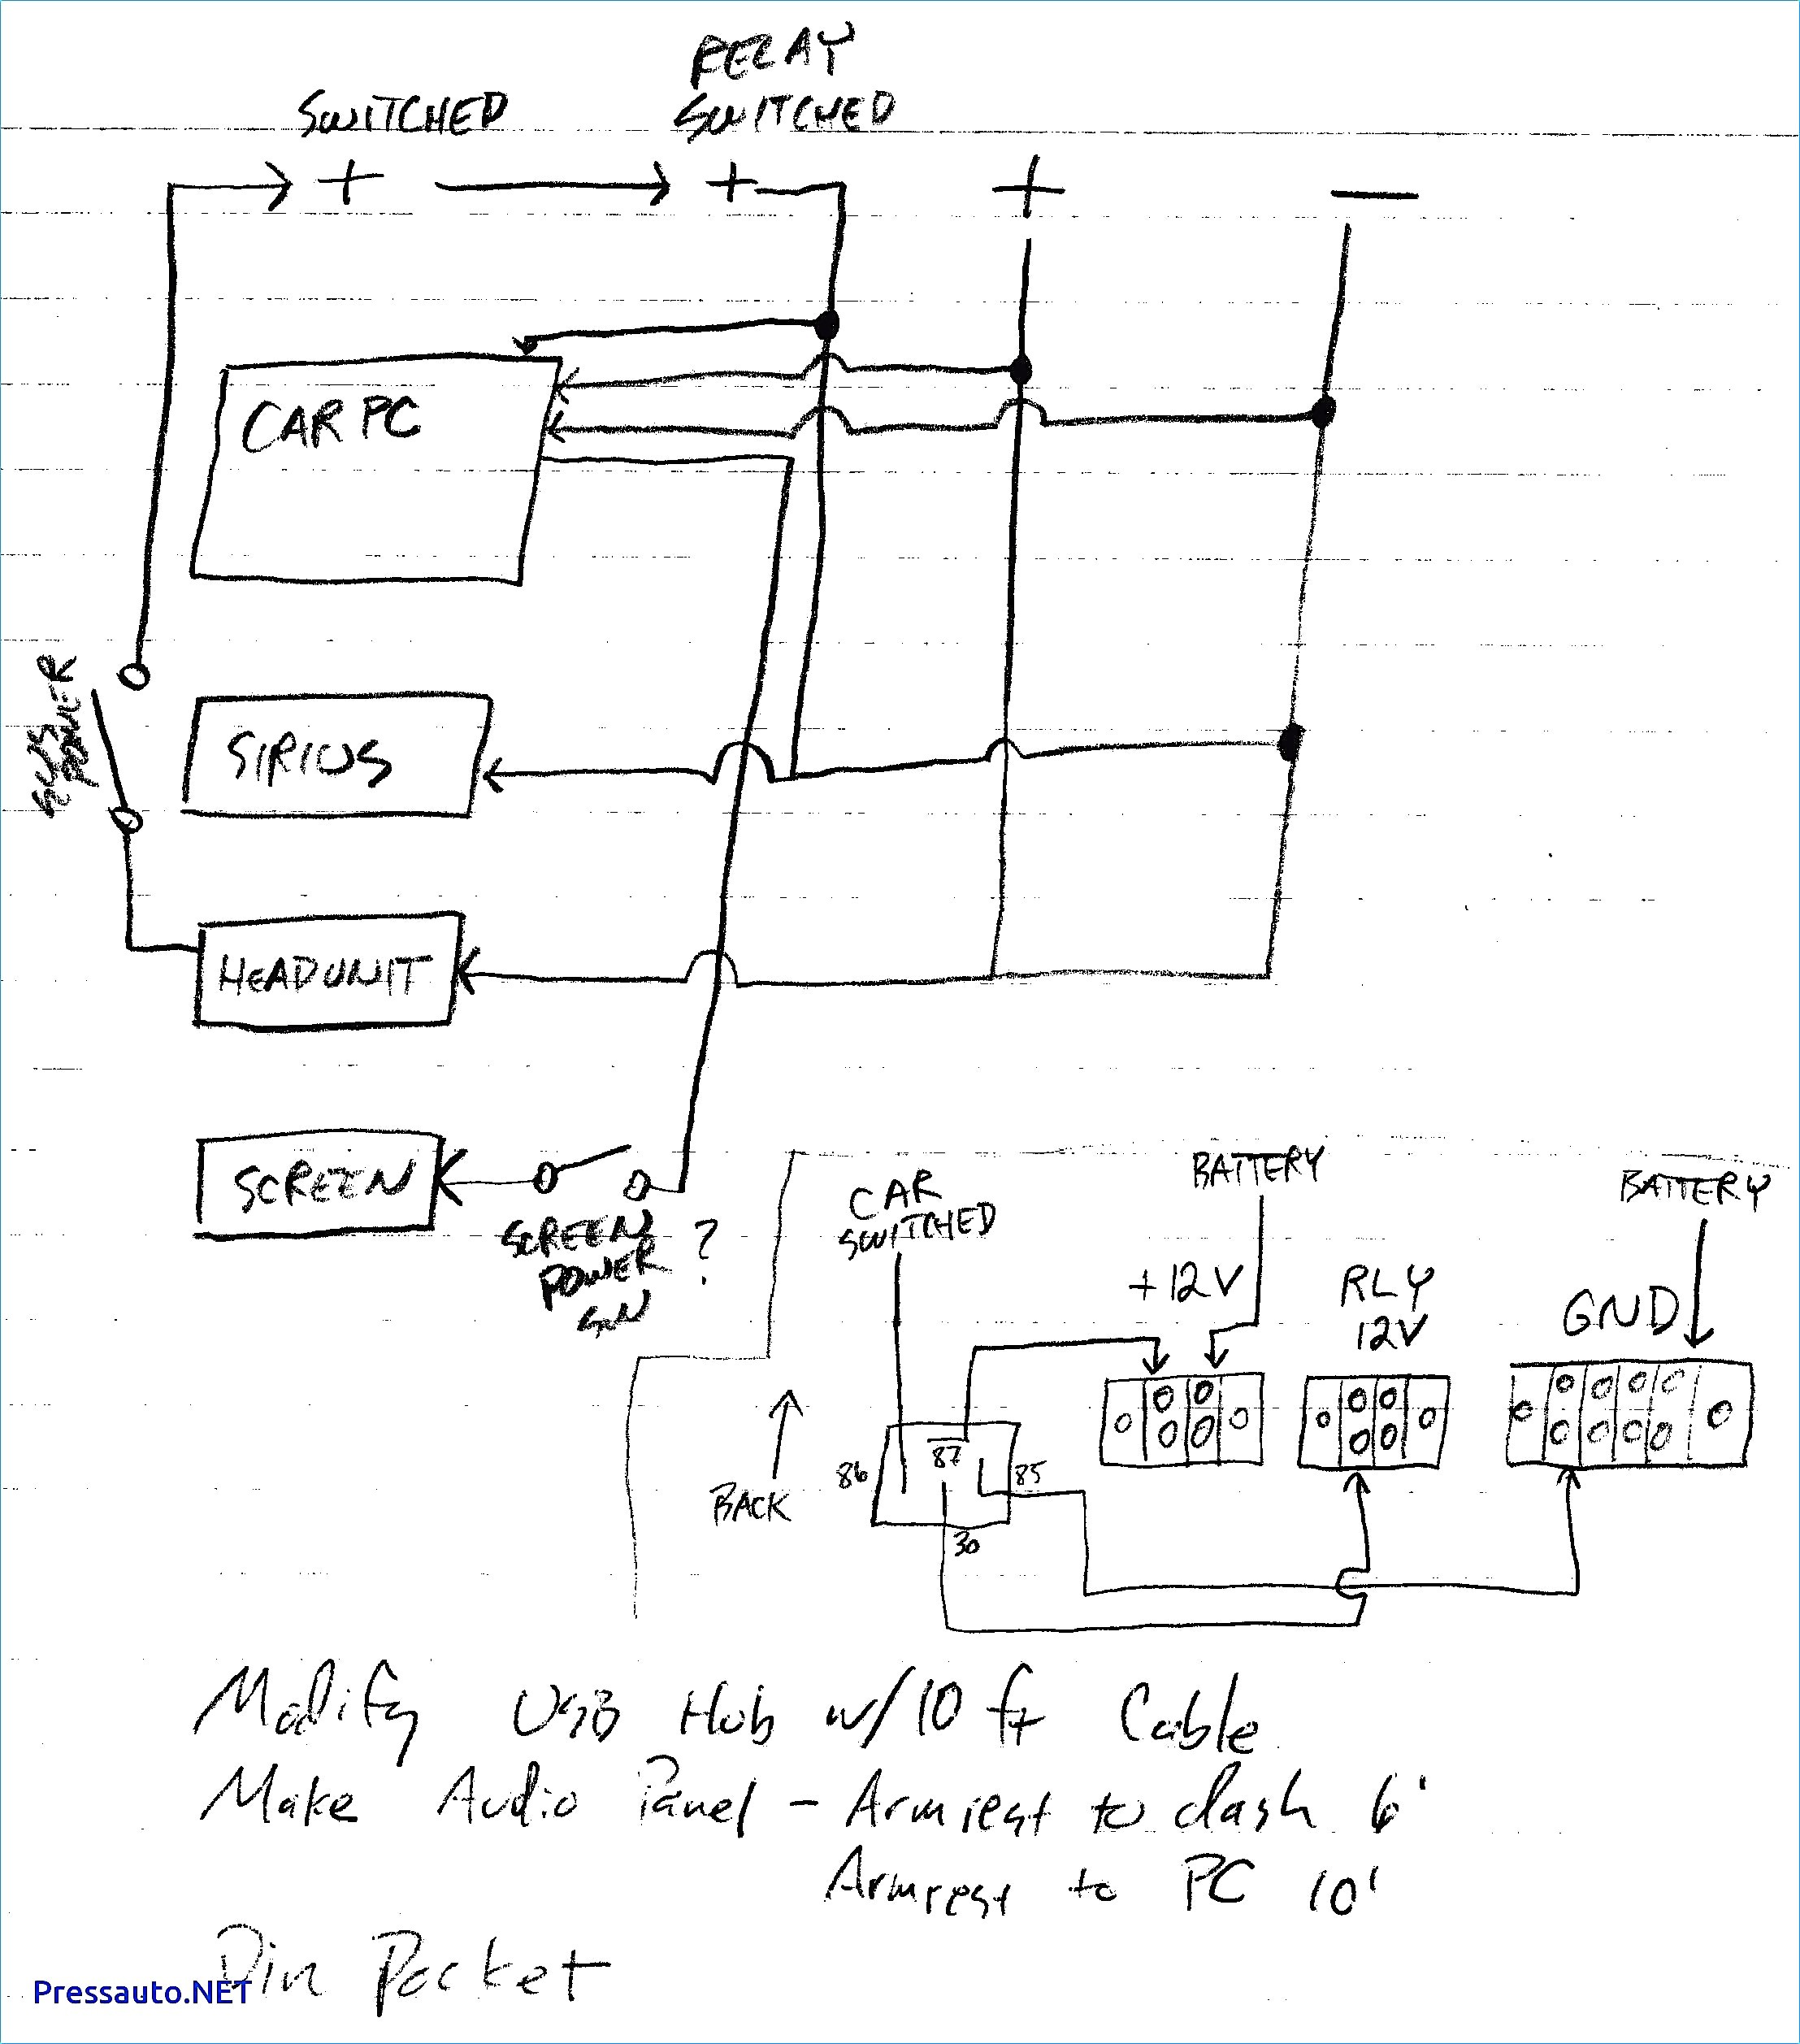 boss plow wiring diagram truck side car pentair wiring diagram lx80 rh detoxicrecenze com Universal Painless Wiring Harness Diagram Model A Wiring Diagram for Generator